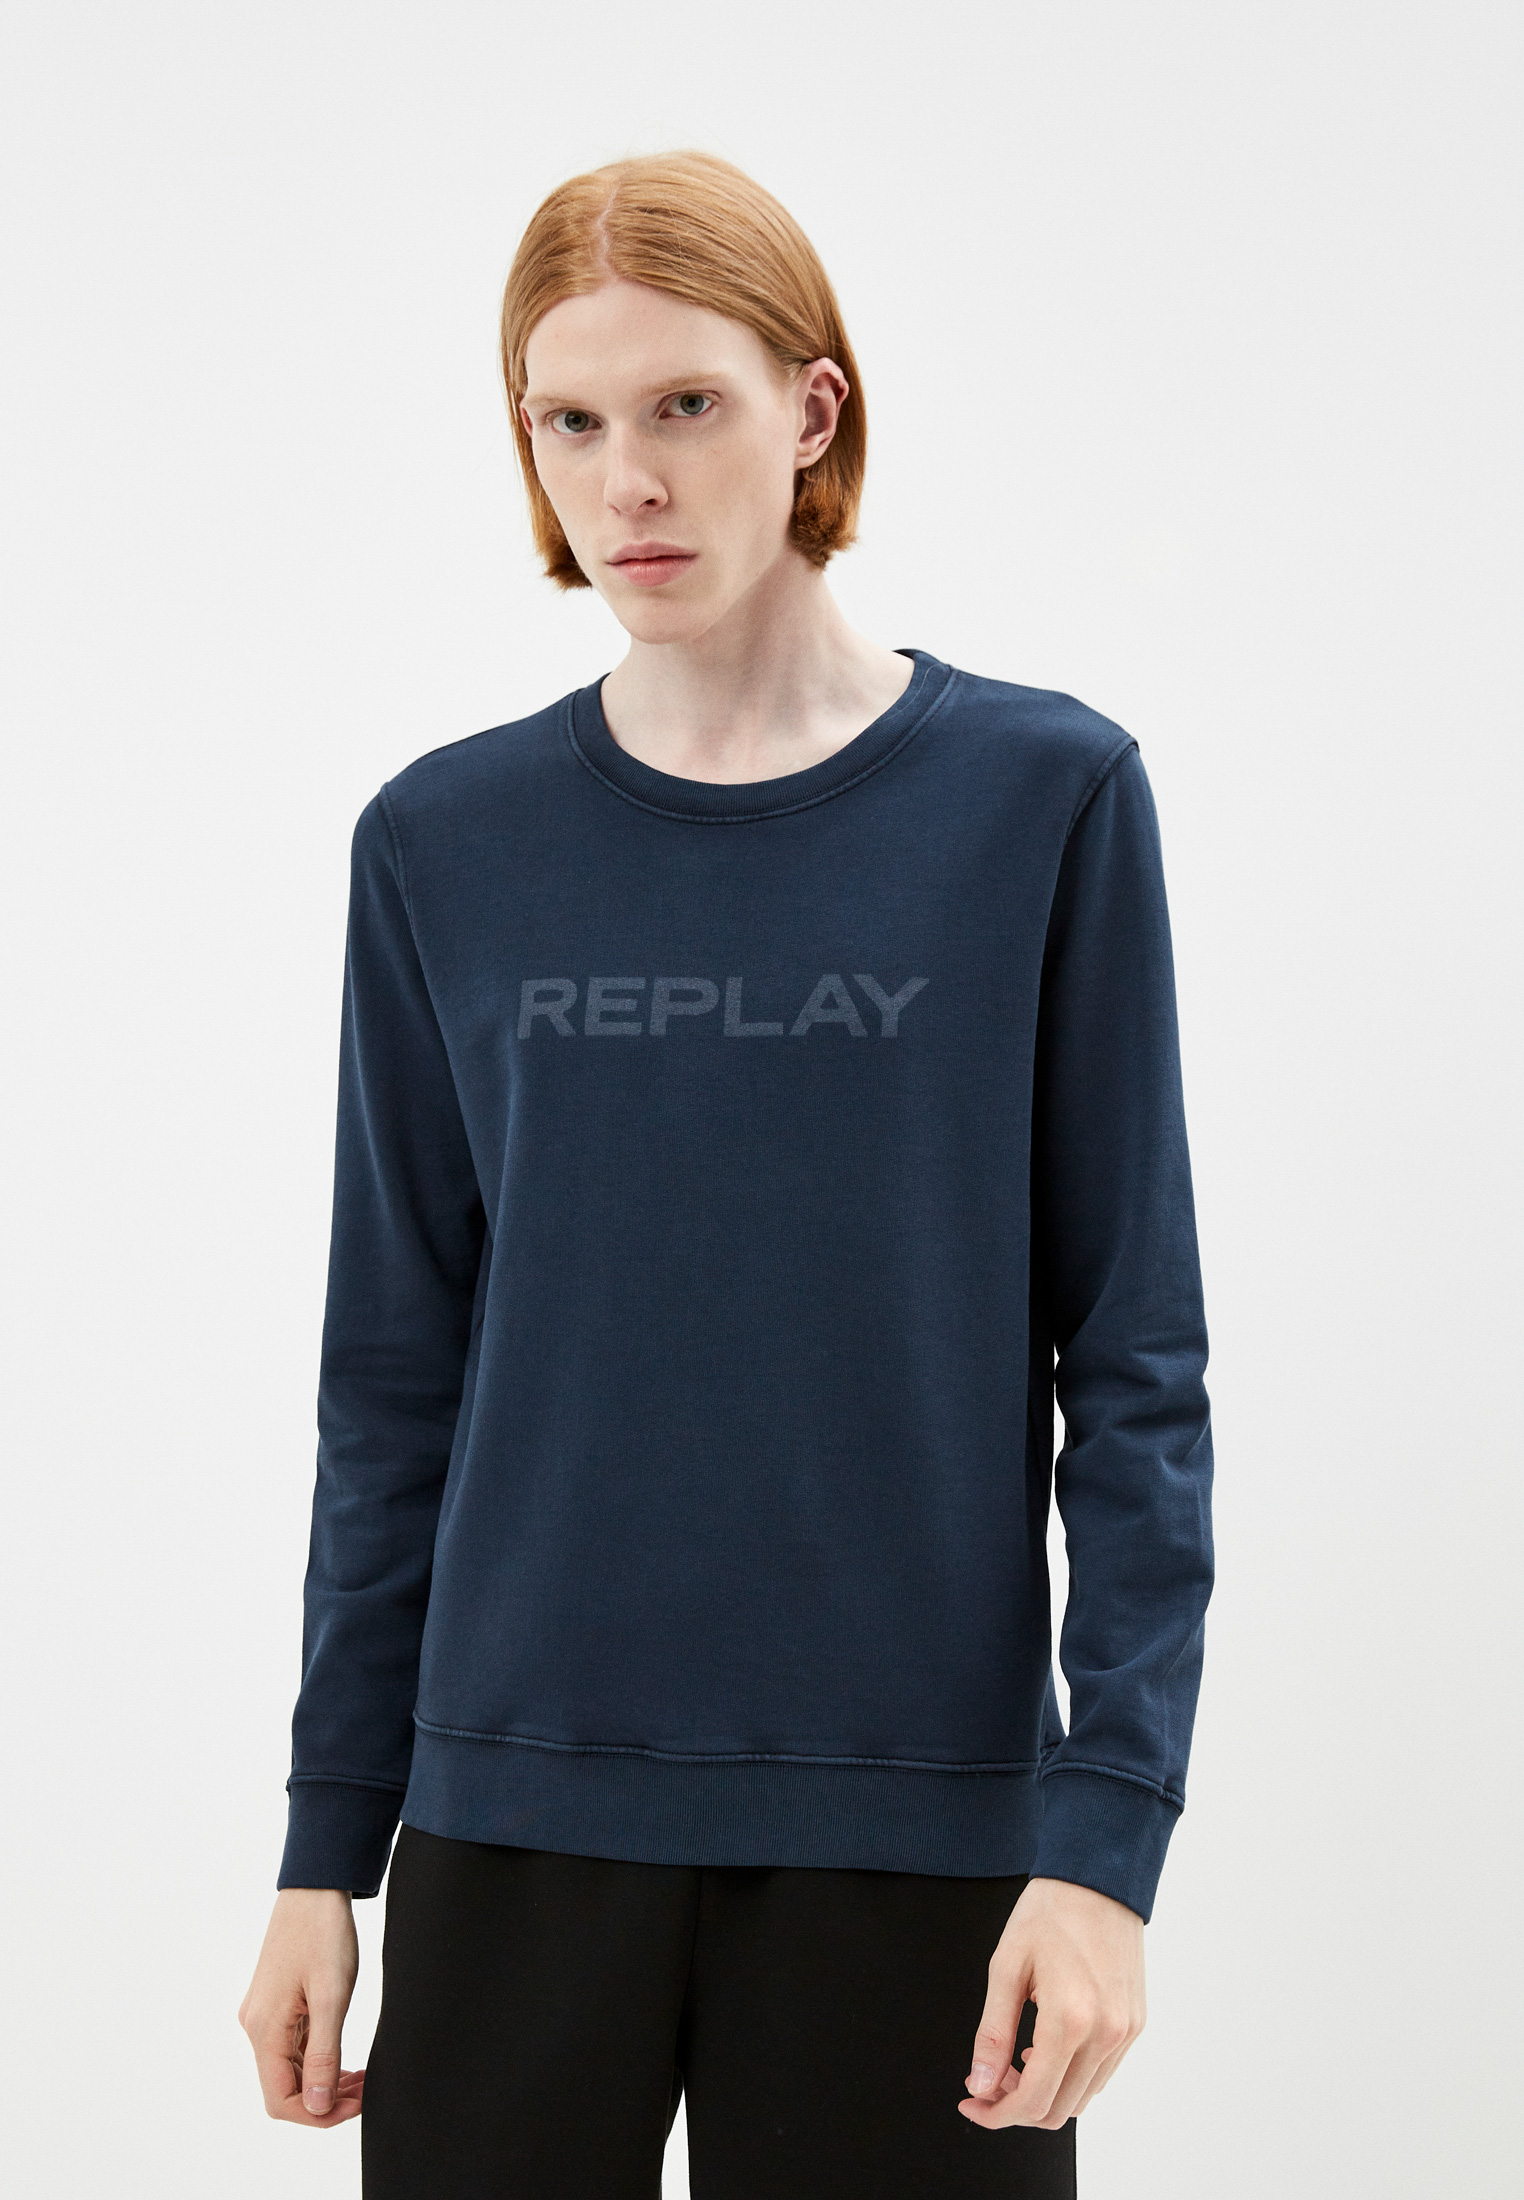 Свитер Replay (Реплей) Свитшот Replay